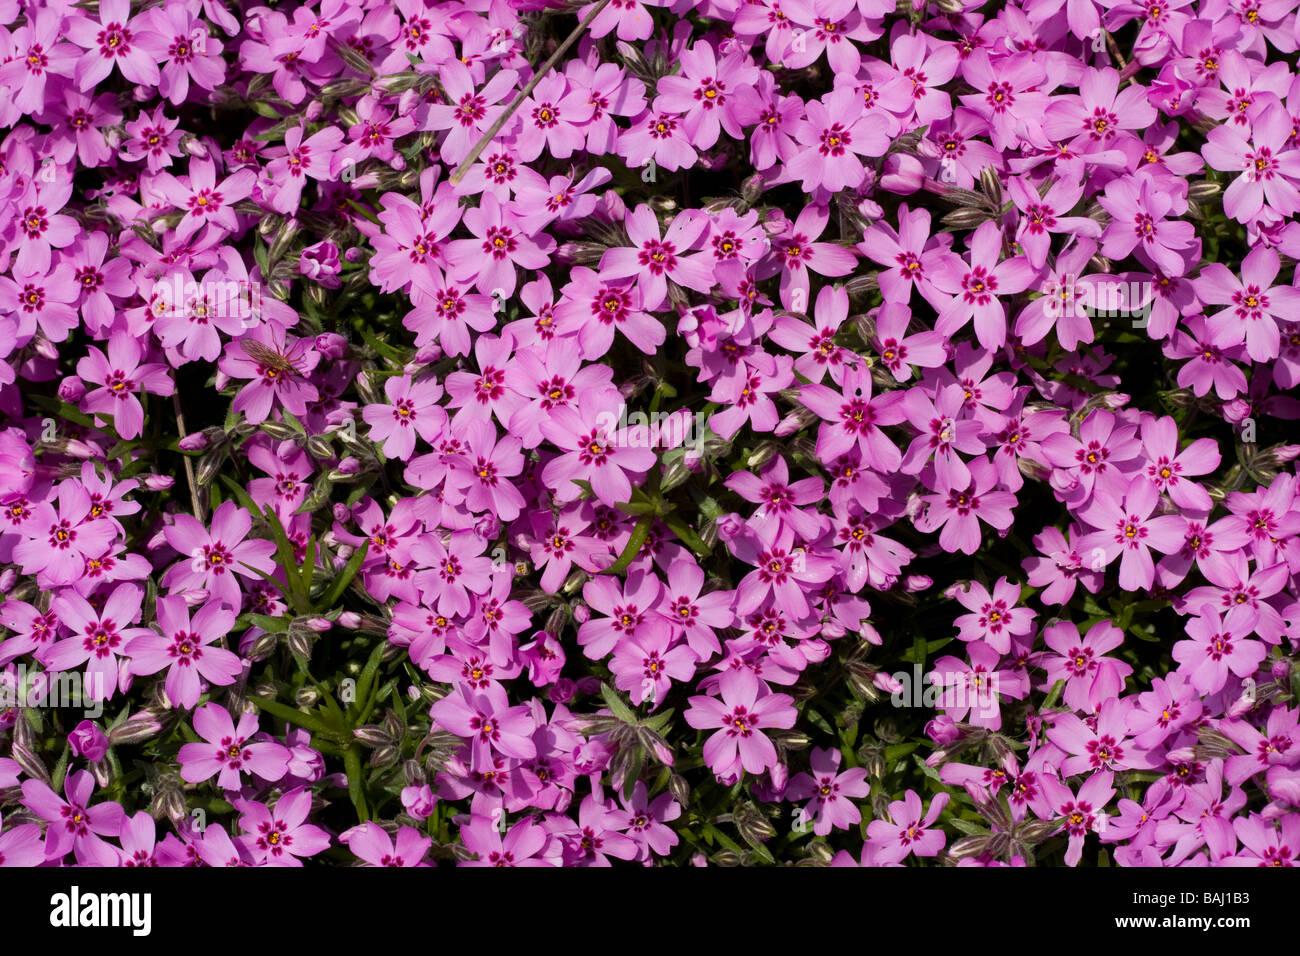 Little Pink Flowers Stock Photo 23753159 Alamy